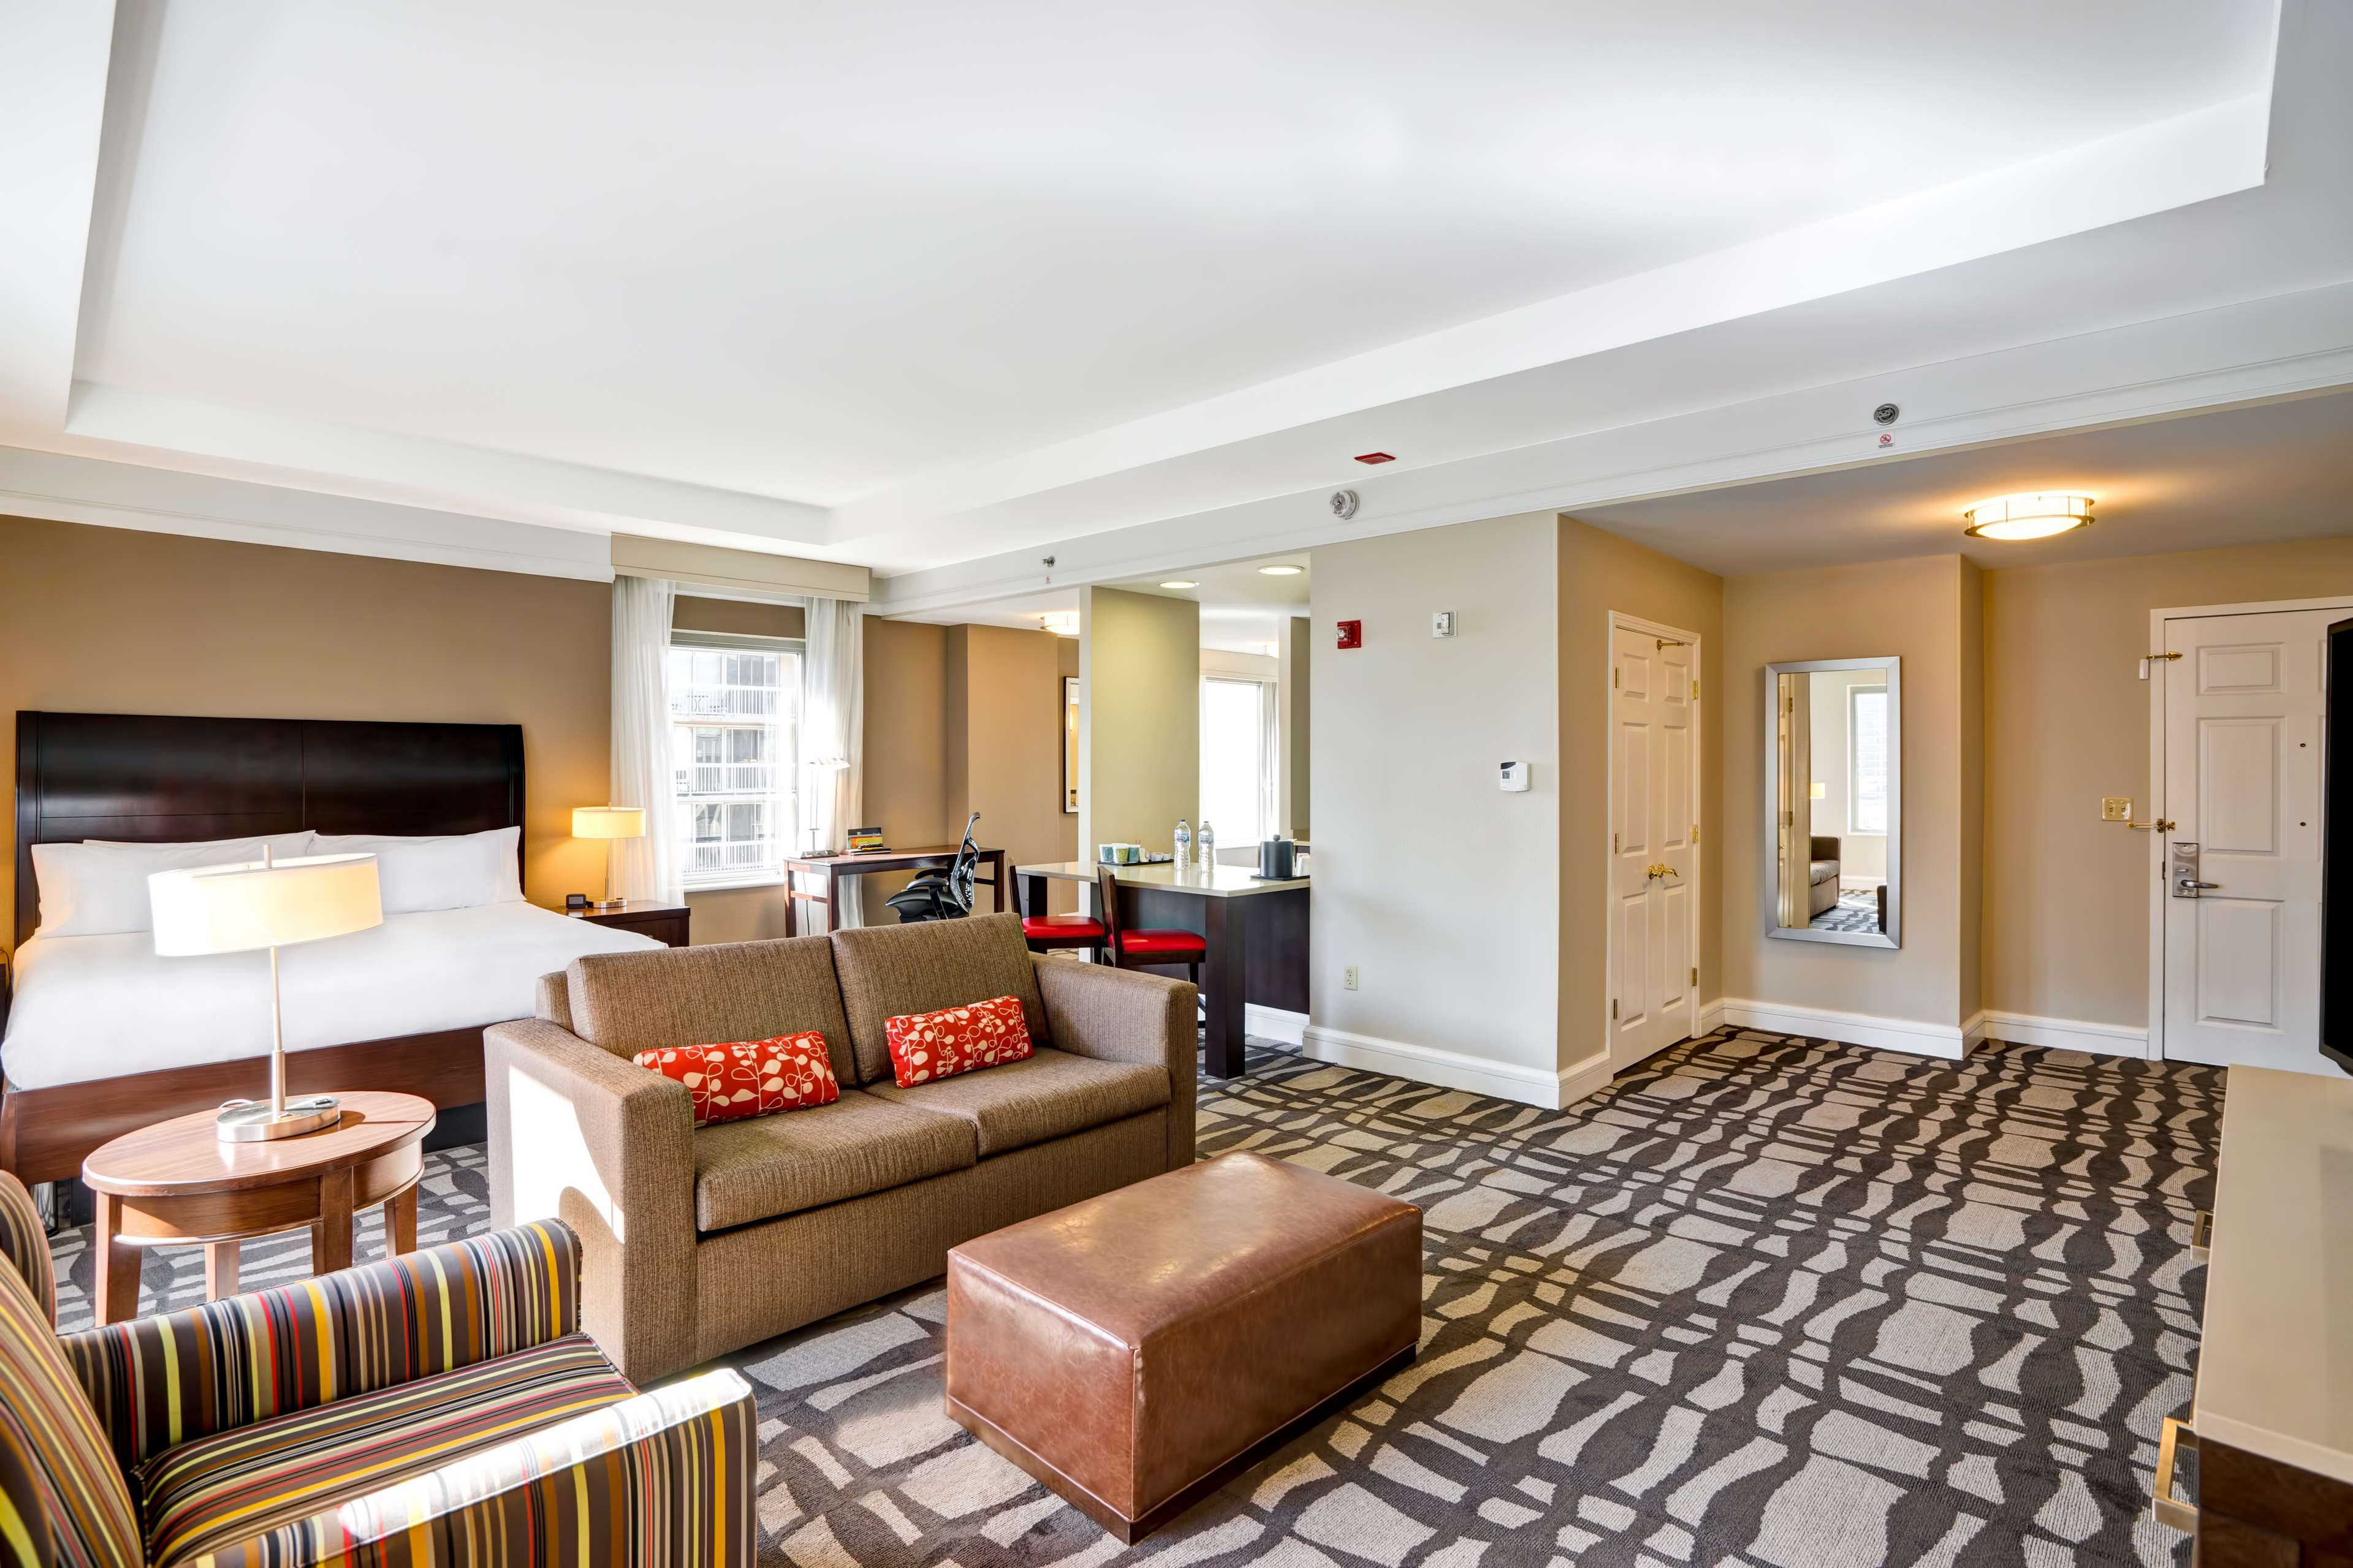 Hilton Garden Inn Chicago Downtown/Magnificent Mile image 16